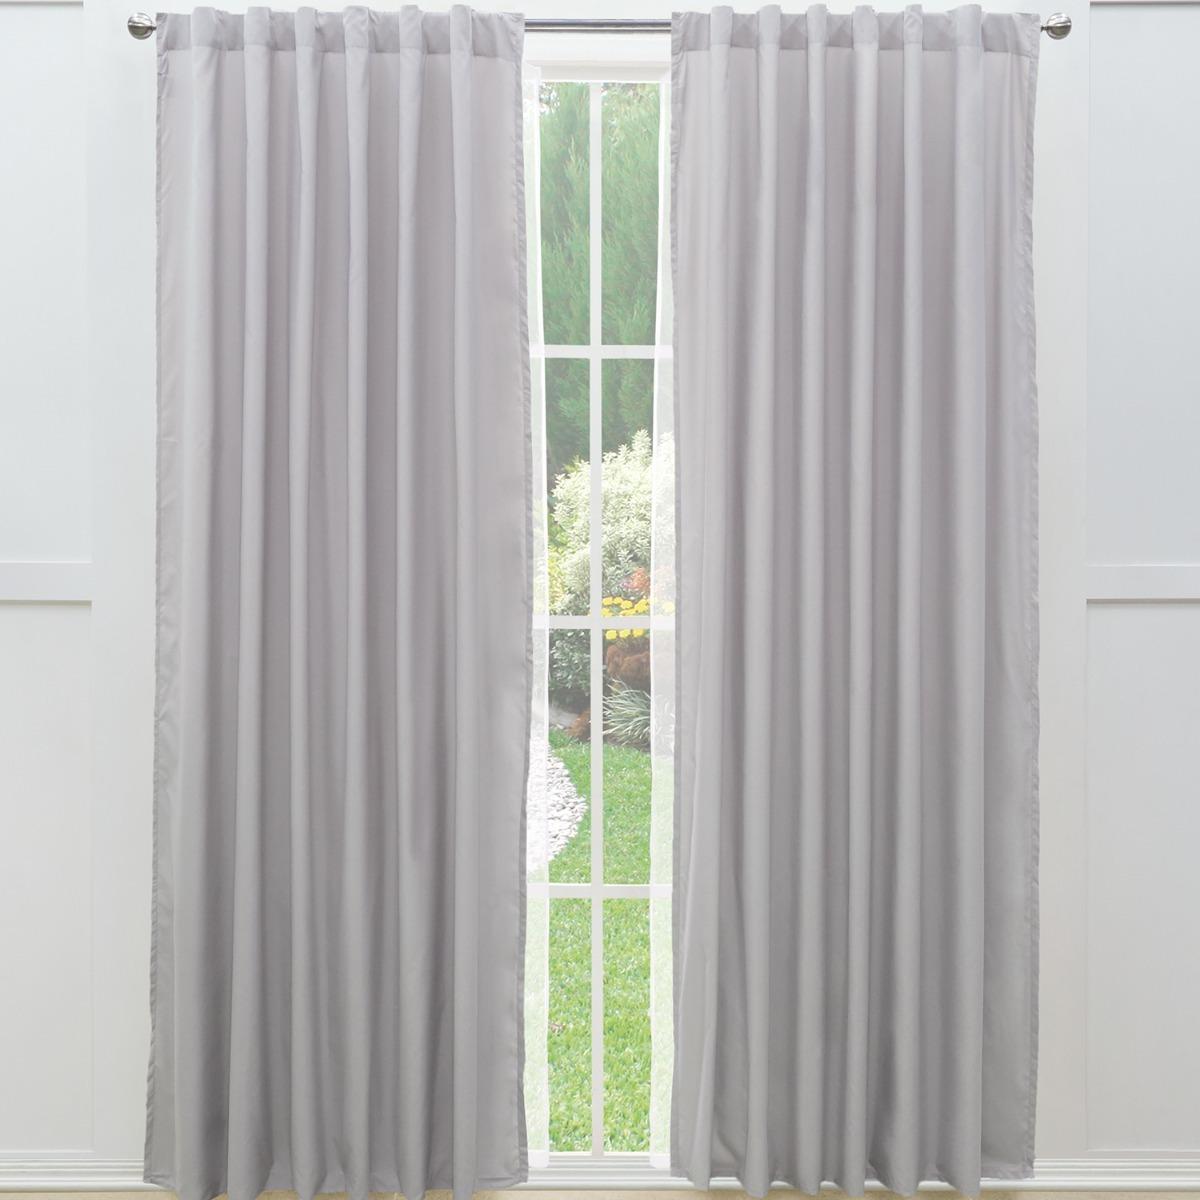 Juego cortinas largas viasoft gris claro vianney 479 for Cortinas largas